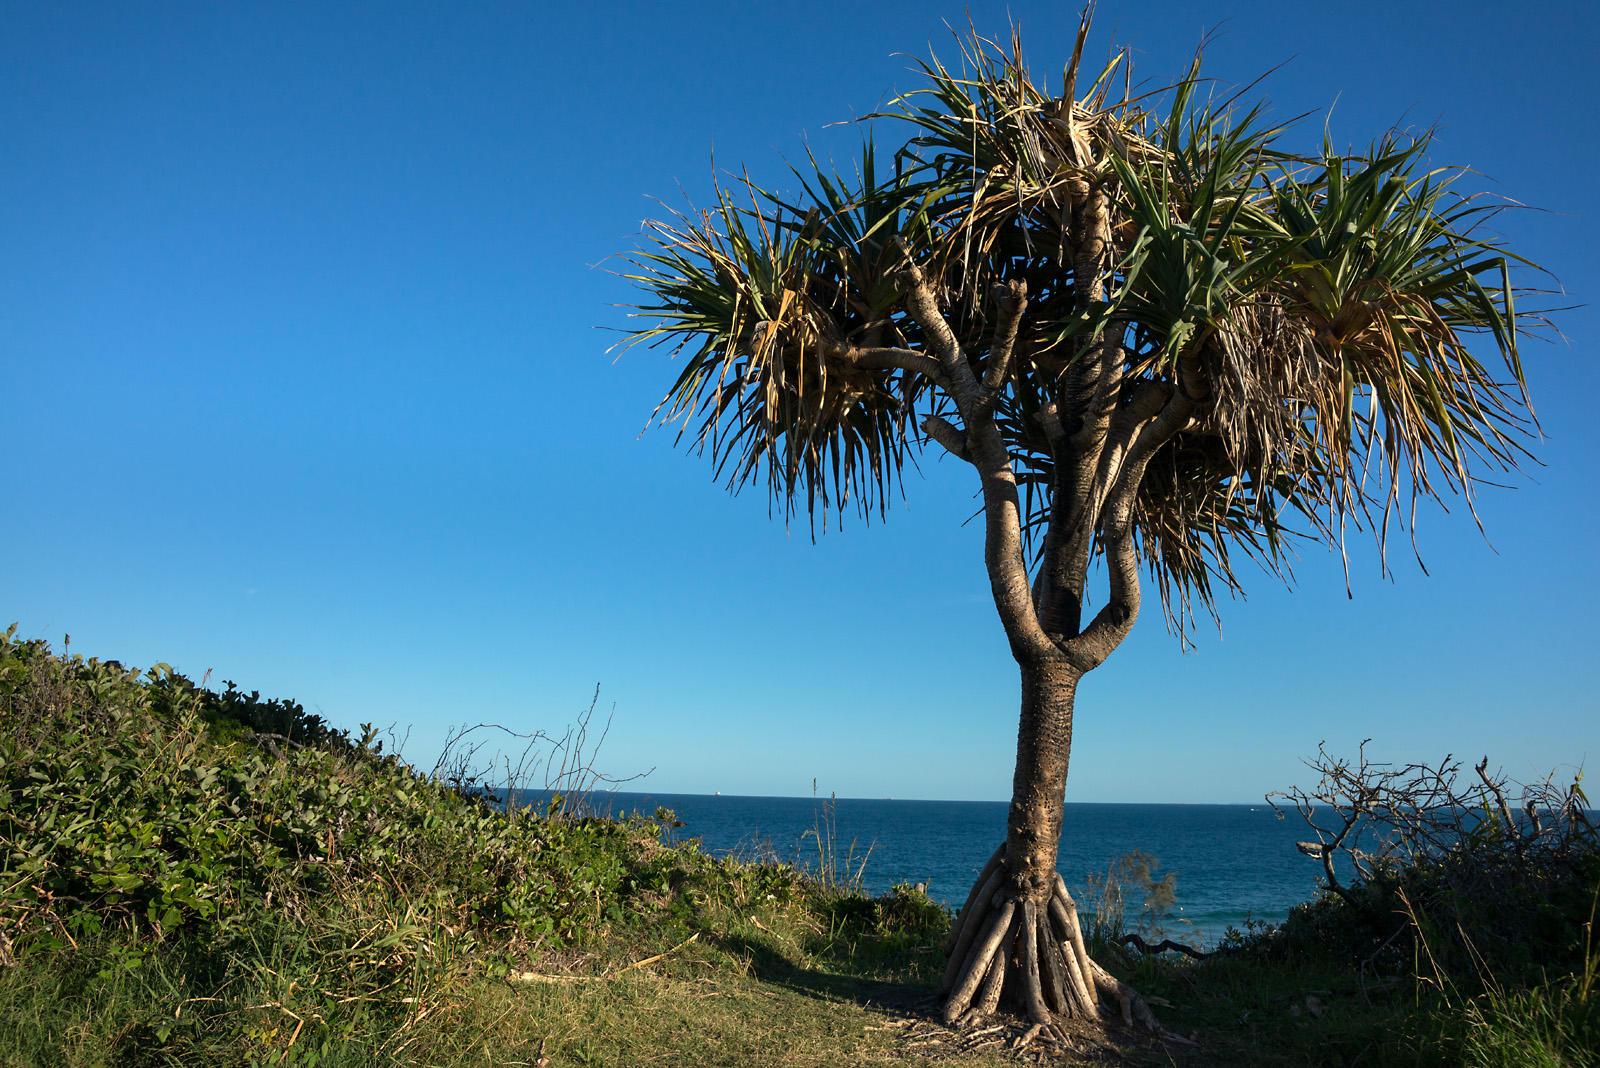 Mooloolaba, Sunshine Coast.